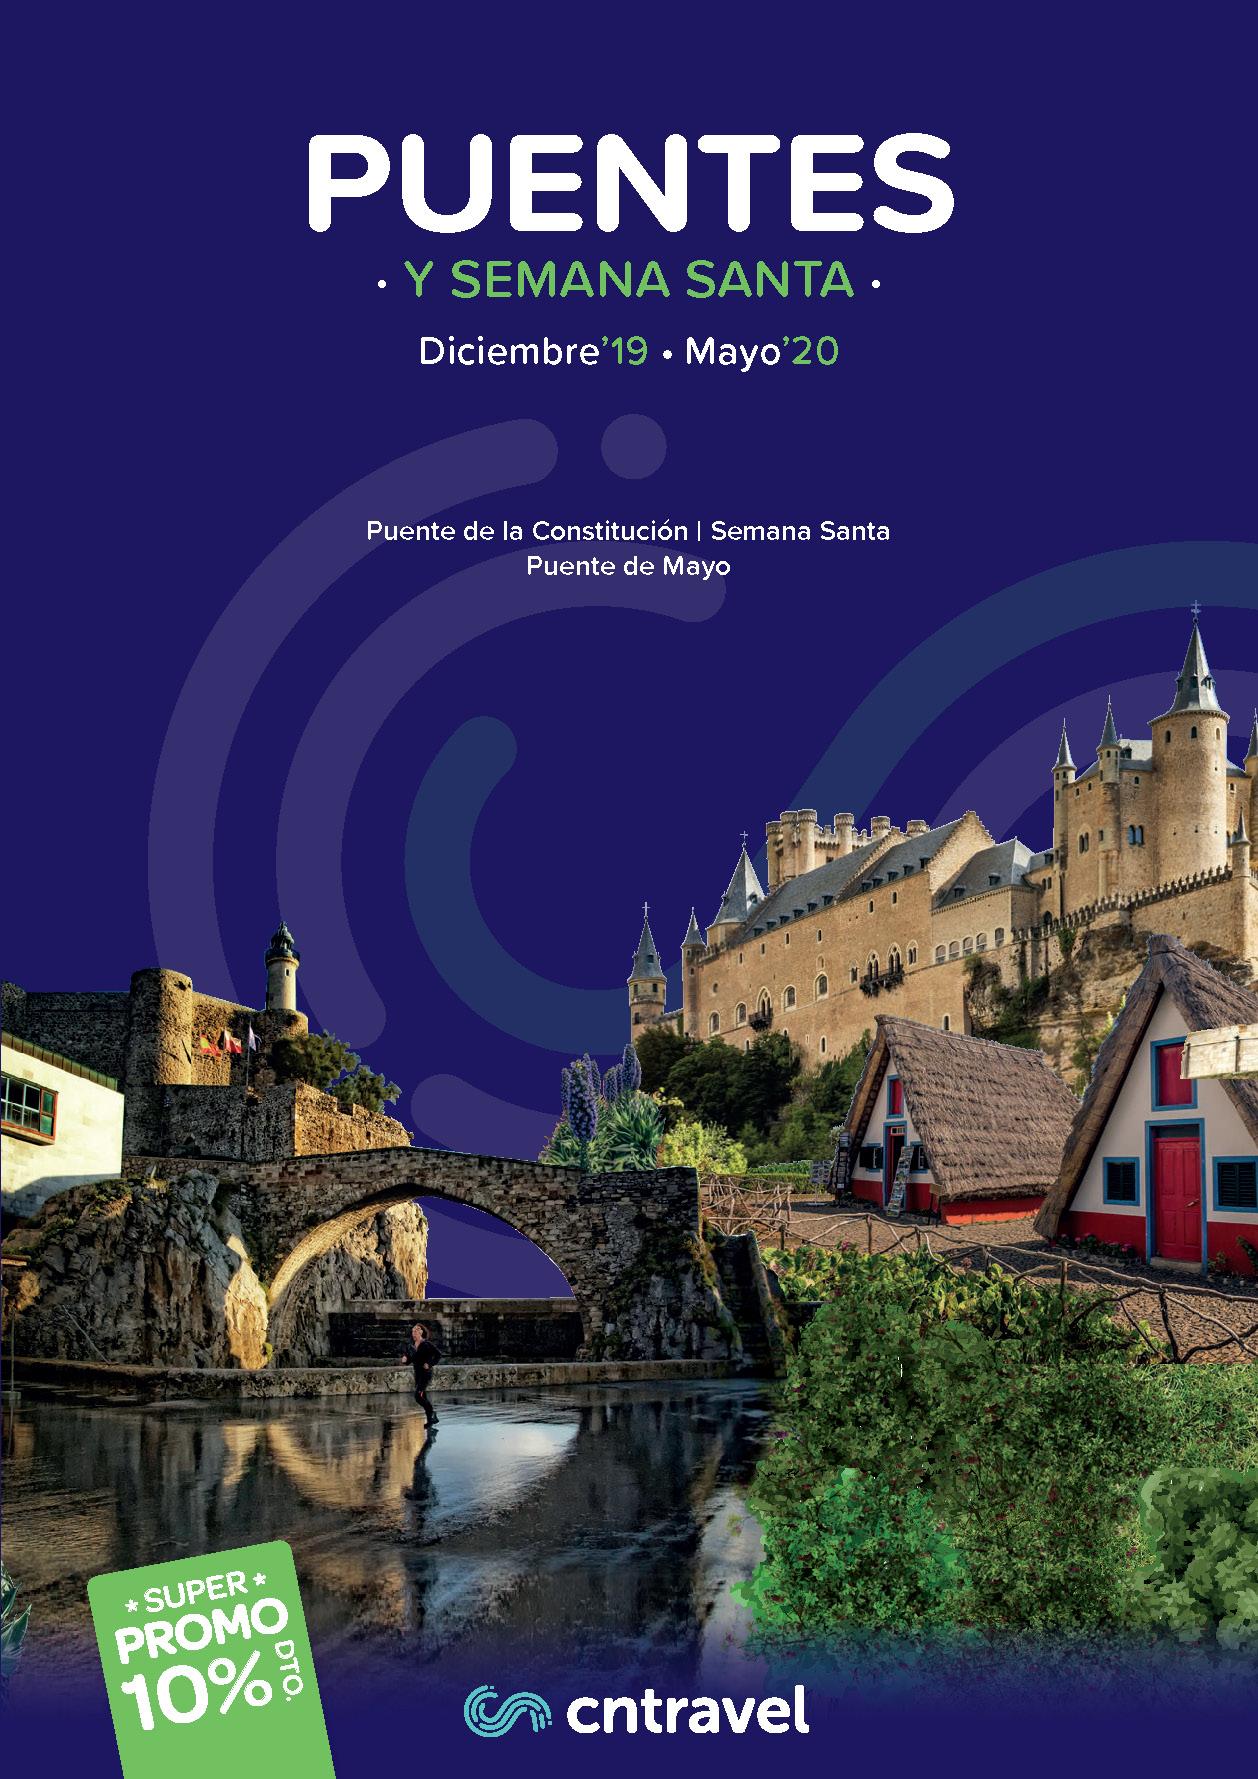 Catalogo CN Travel Puentes 2019-2020 salidas Noroeste